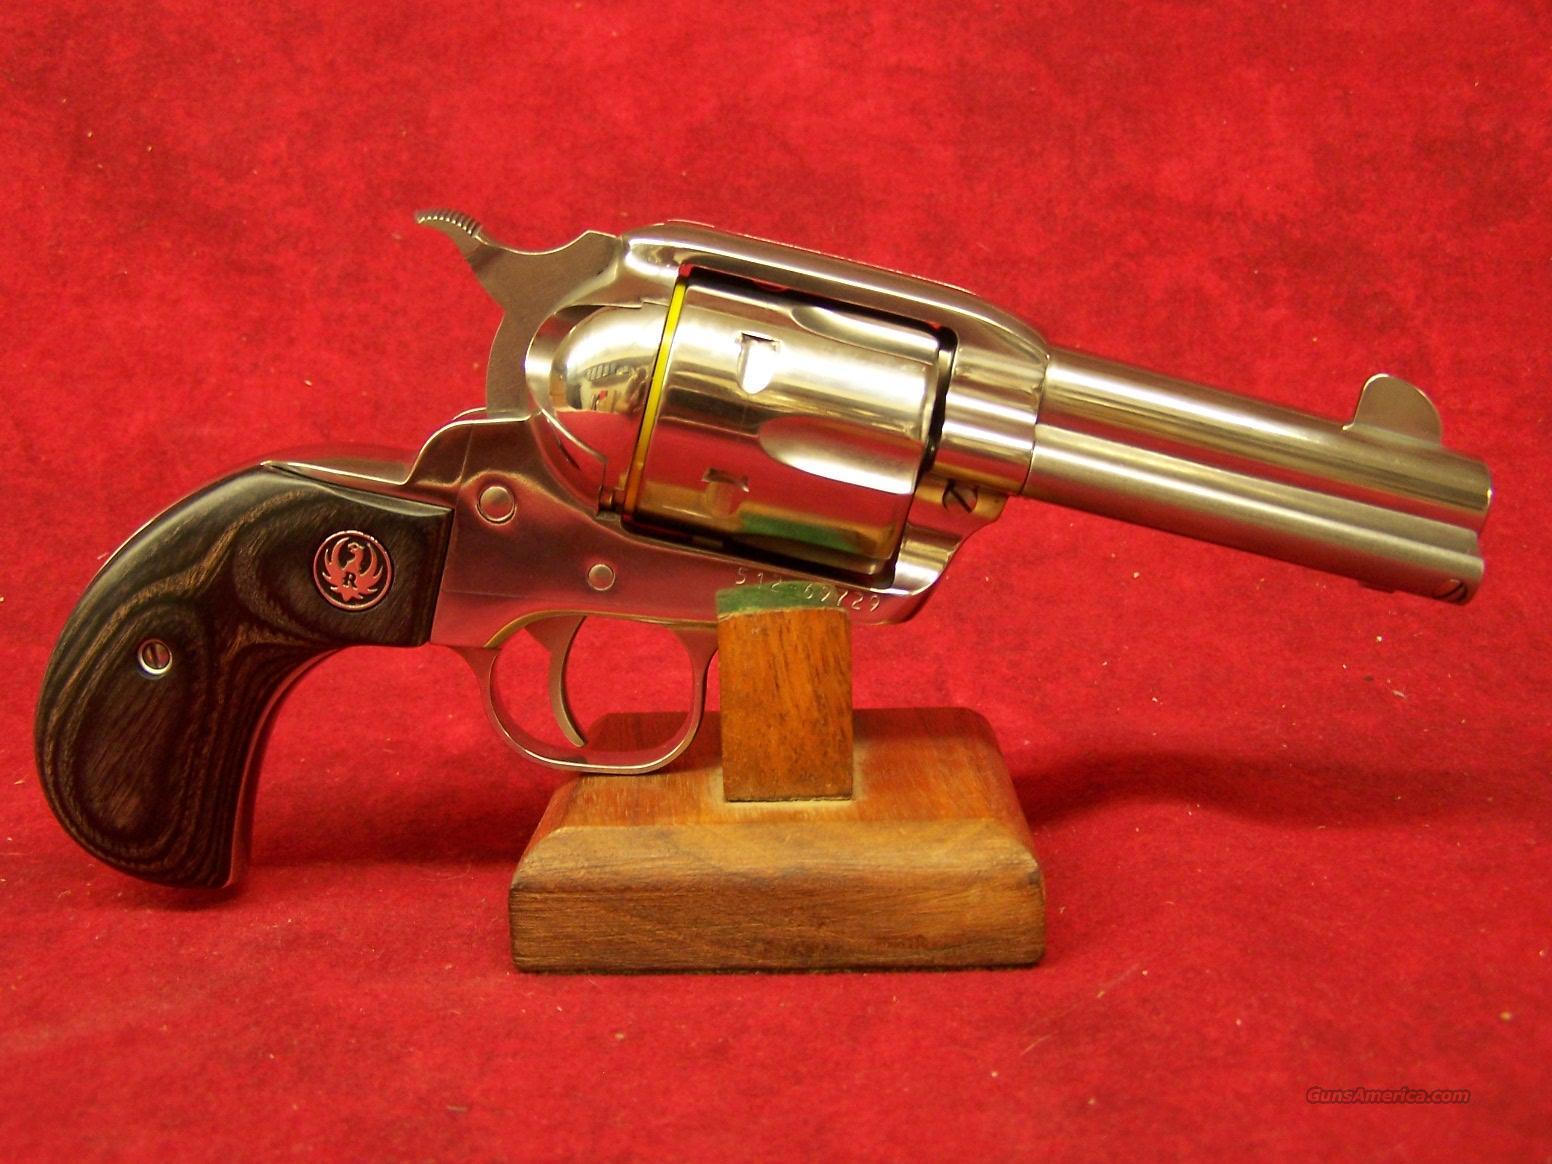 "RUGER VAQUERO BIRDS HEAD 45LC 3.75"" TALO (05151)  Guns > Pistols > Ruger Single Action Revolvers > Cowboy Action"